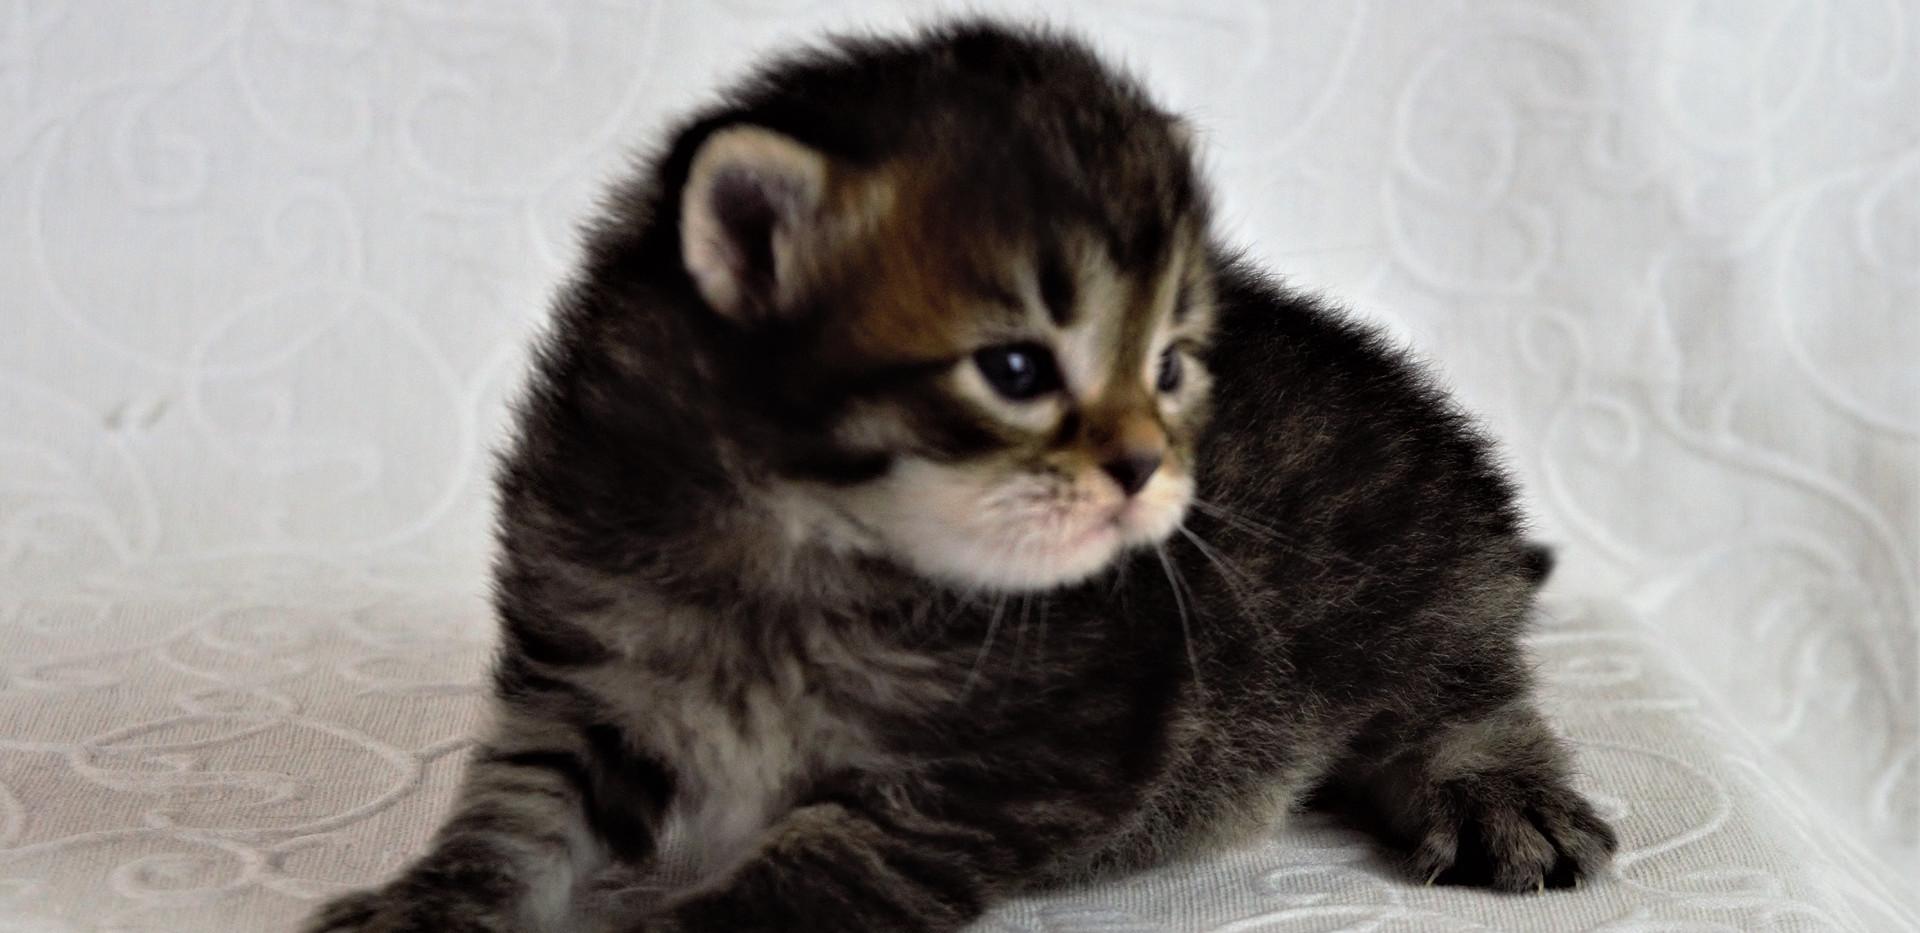 Keuka Ridge Barnaby Lionheart - 3 Weeks Old